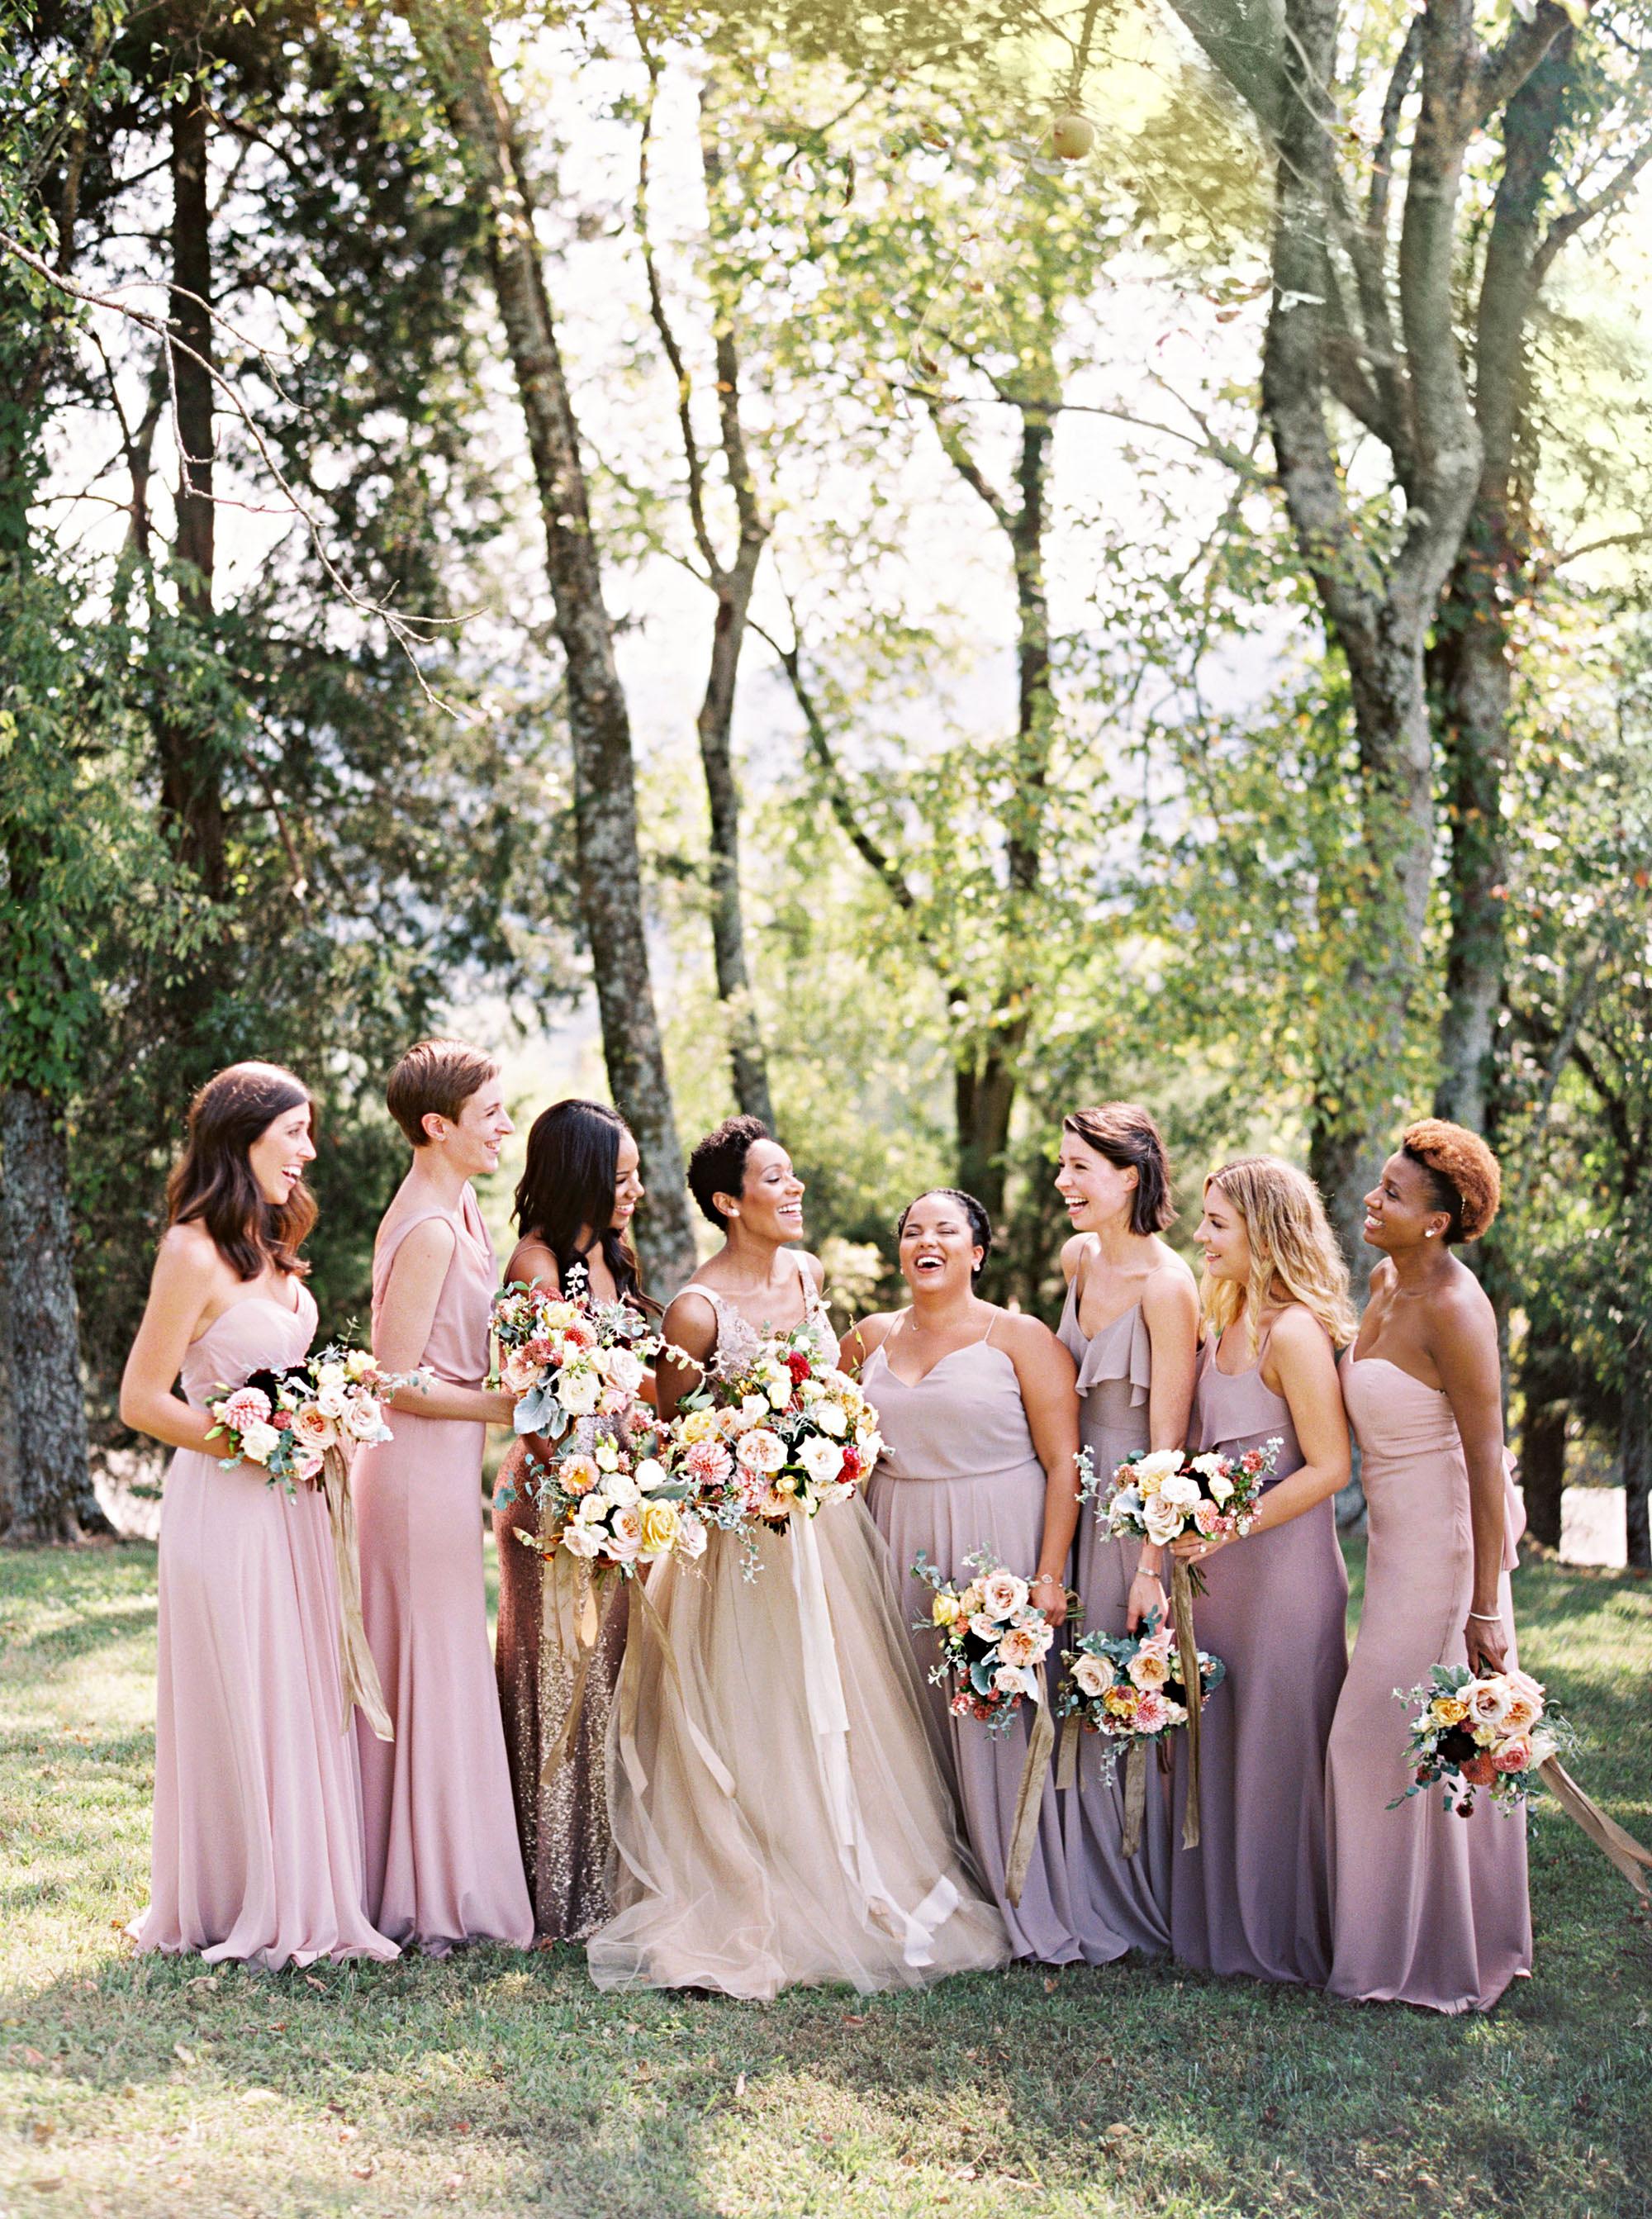 amanda william wedding tennessee purple bridesmaids